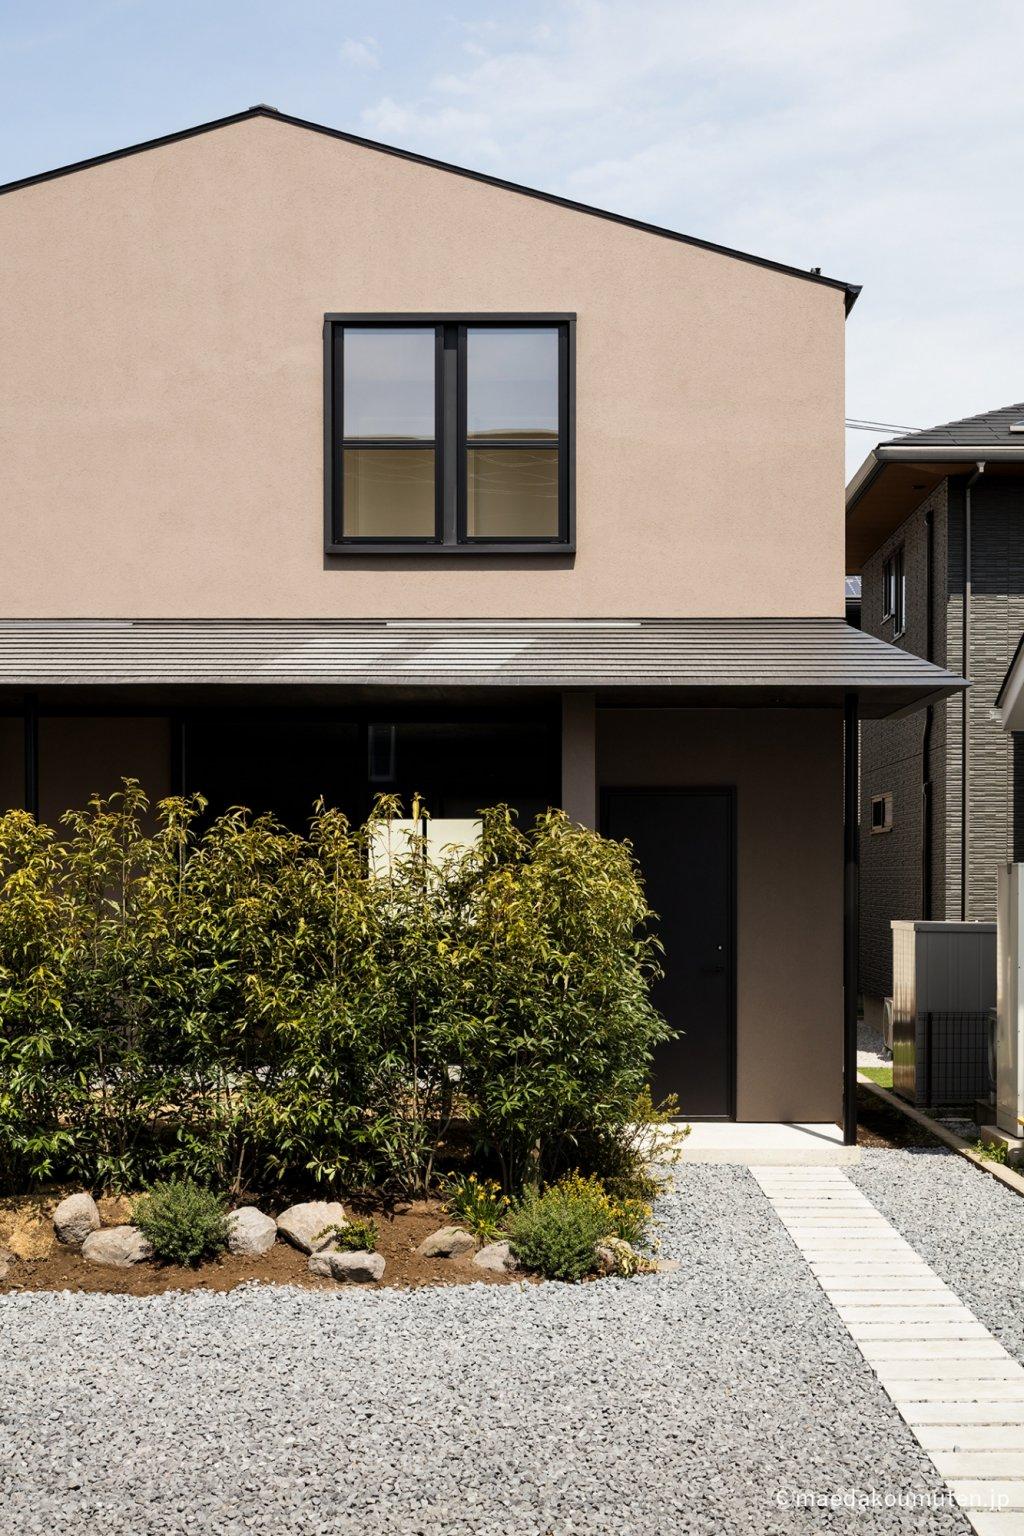 神奈川、工務店、注文住宅、デザイン住宅、建築家、大島の家、02